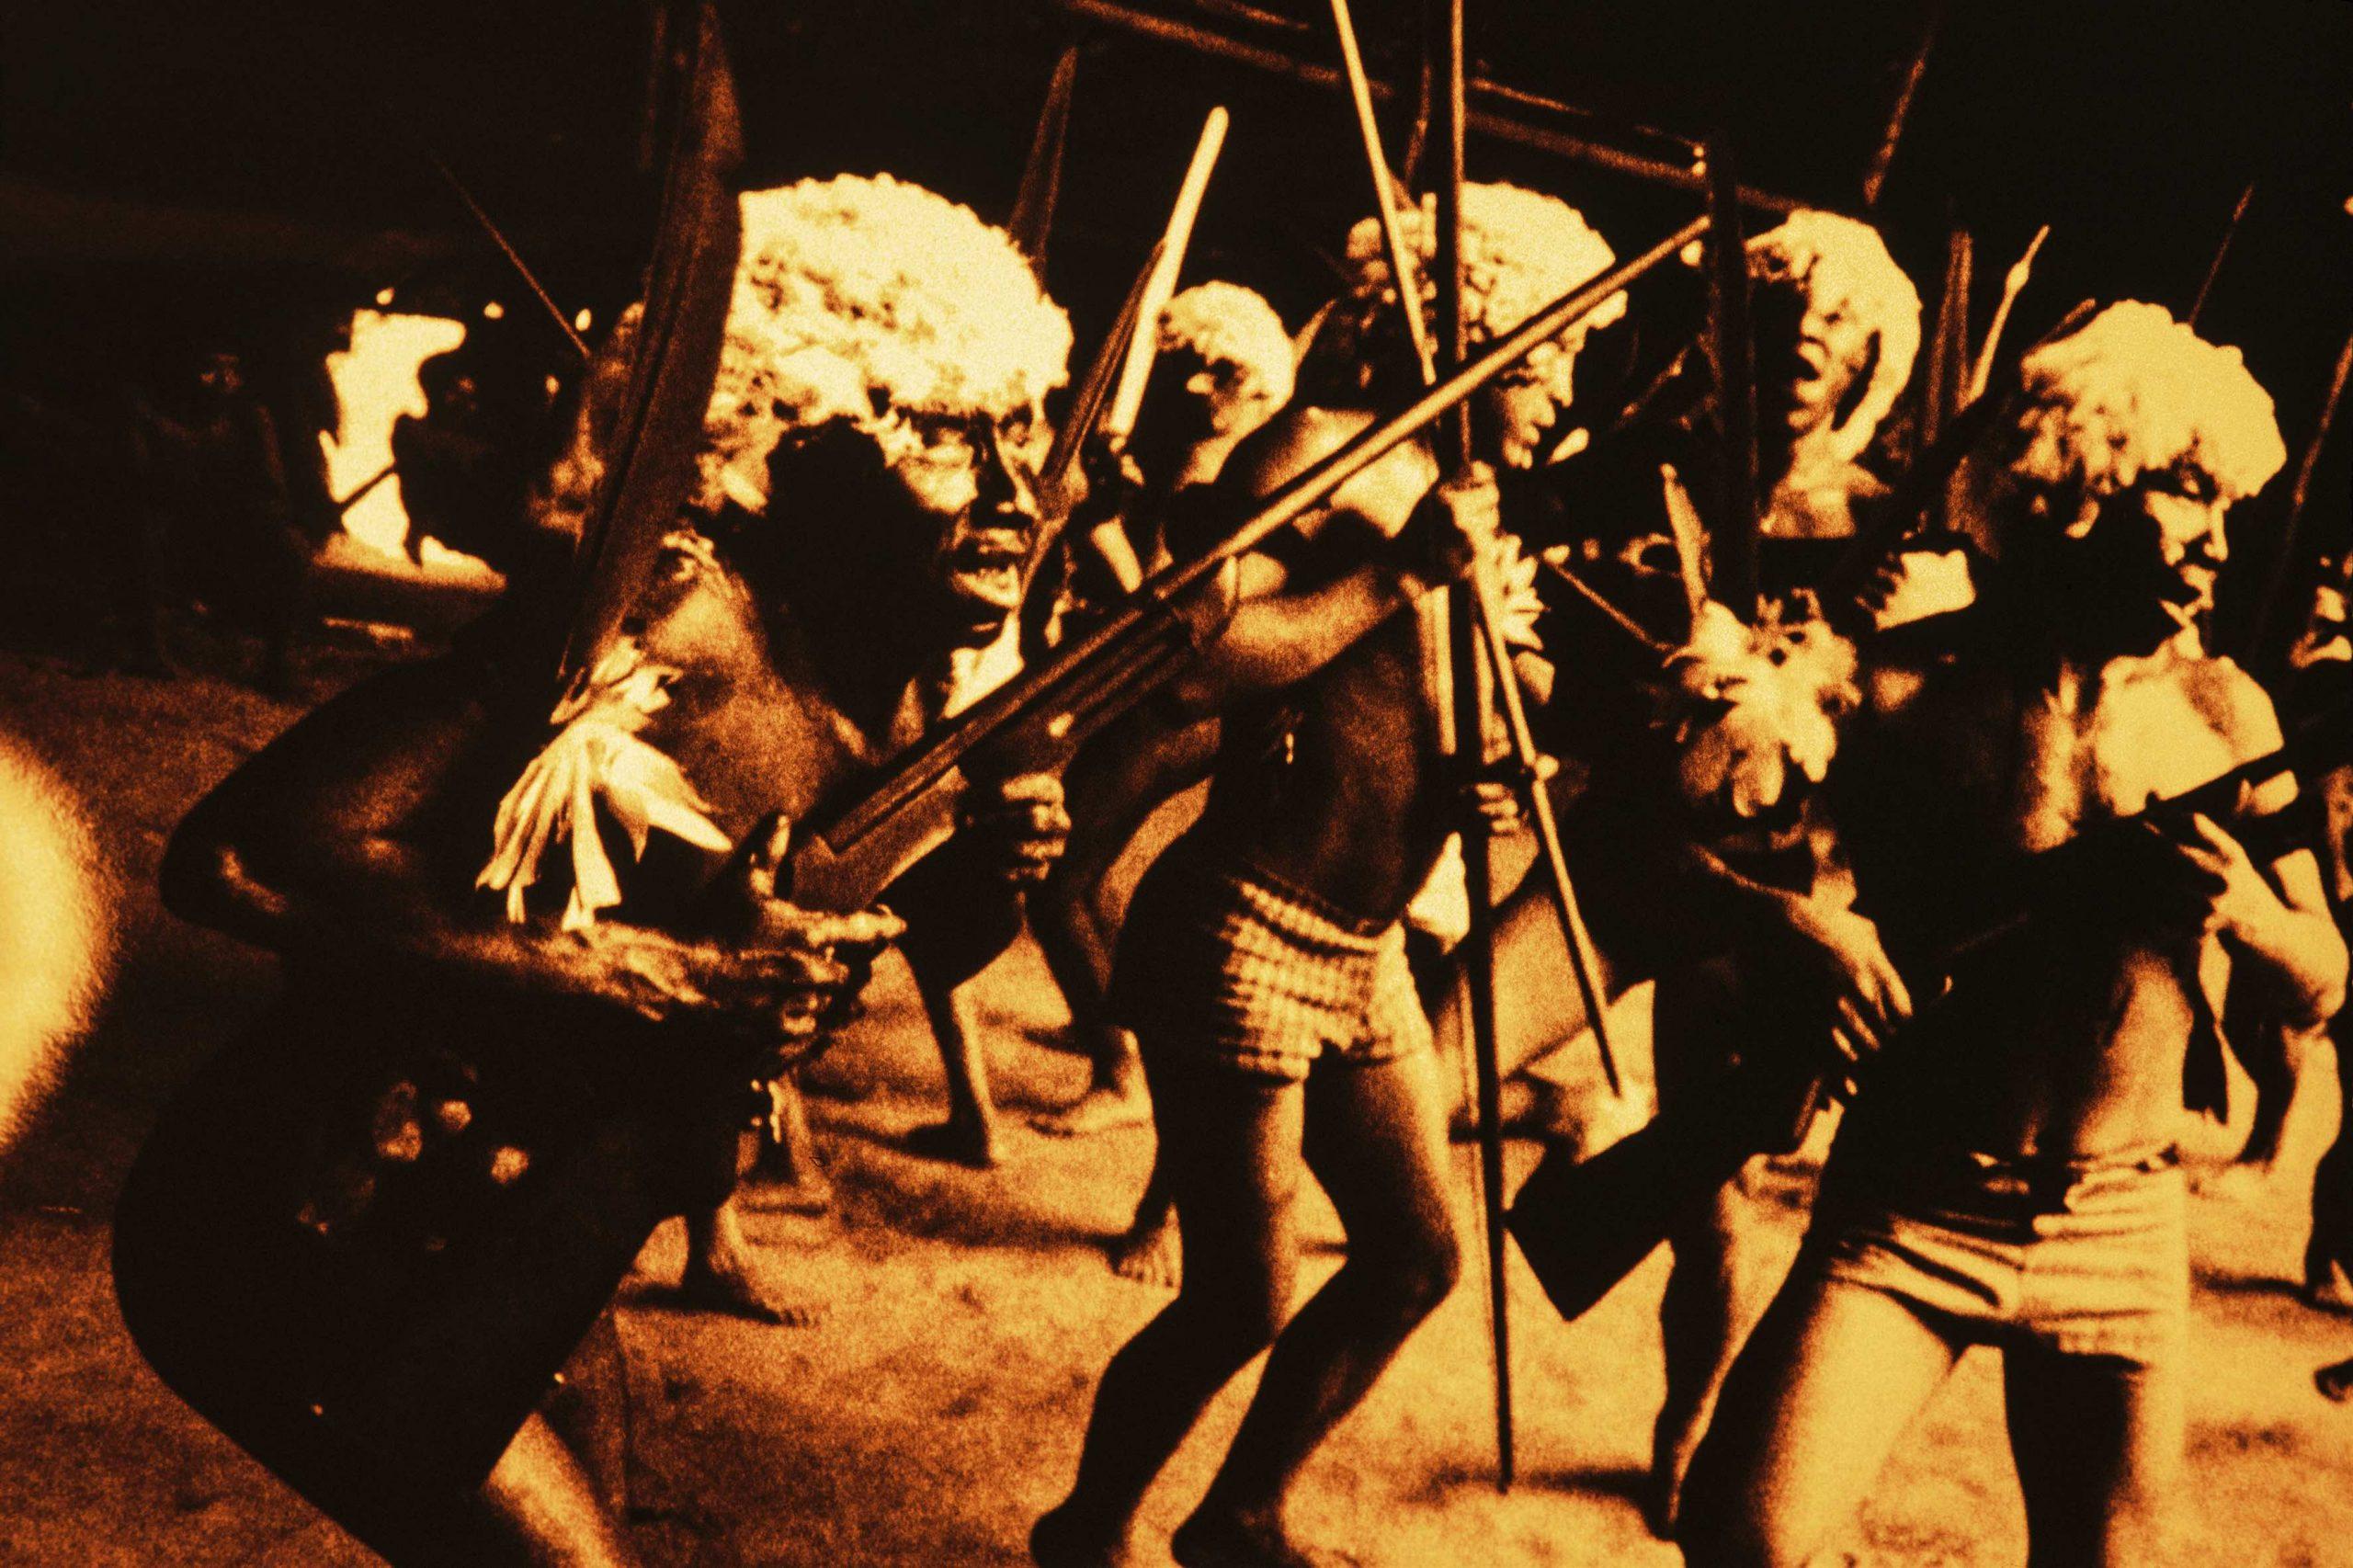 Amazon Slides from the audiovisual projection of Genocídio do Yanomami: morte do Brasil, 1989-2018.